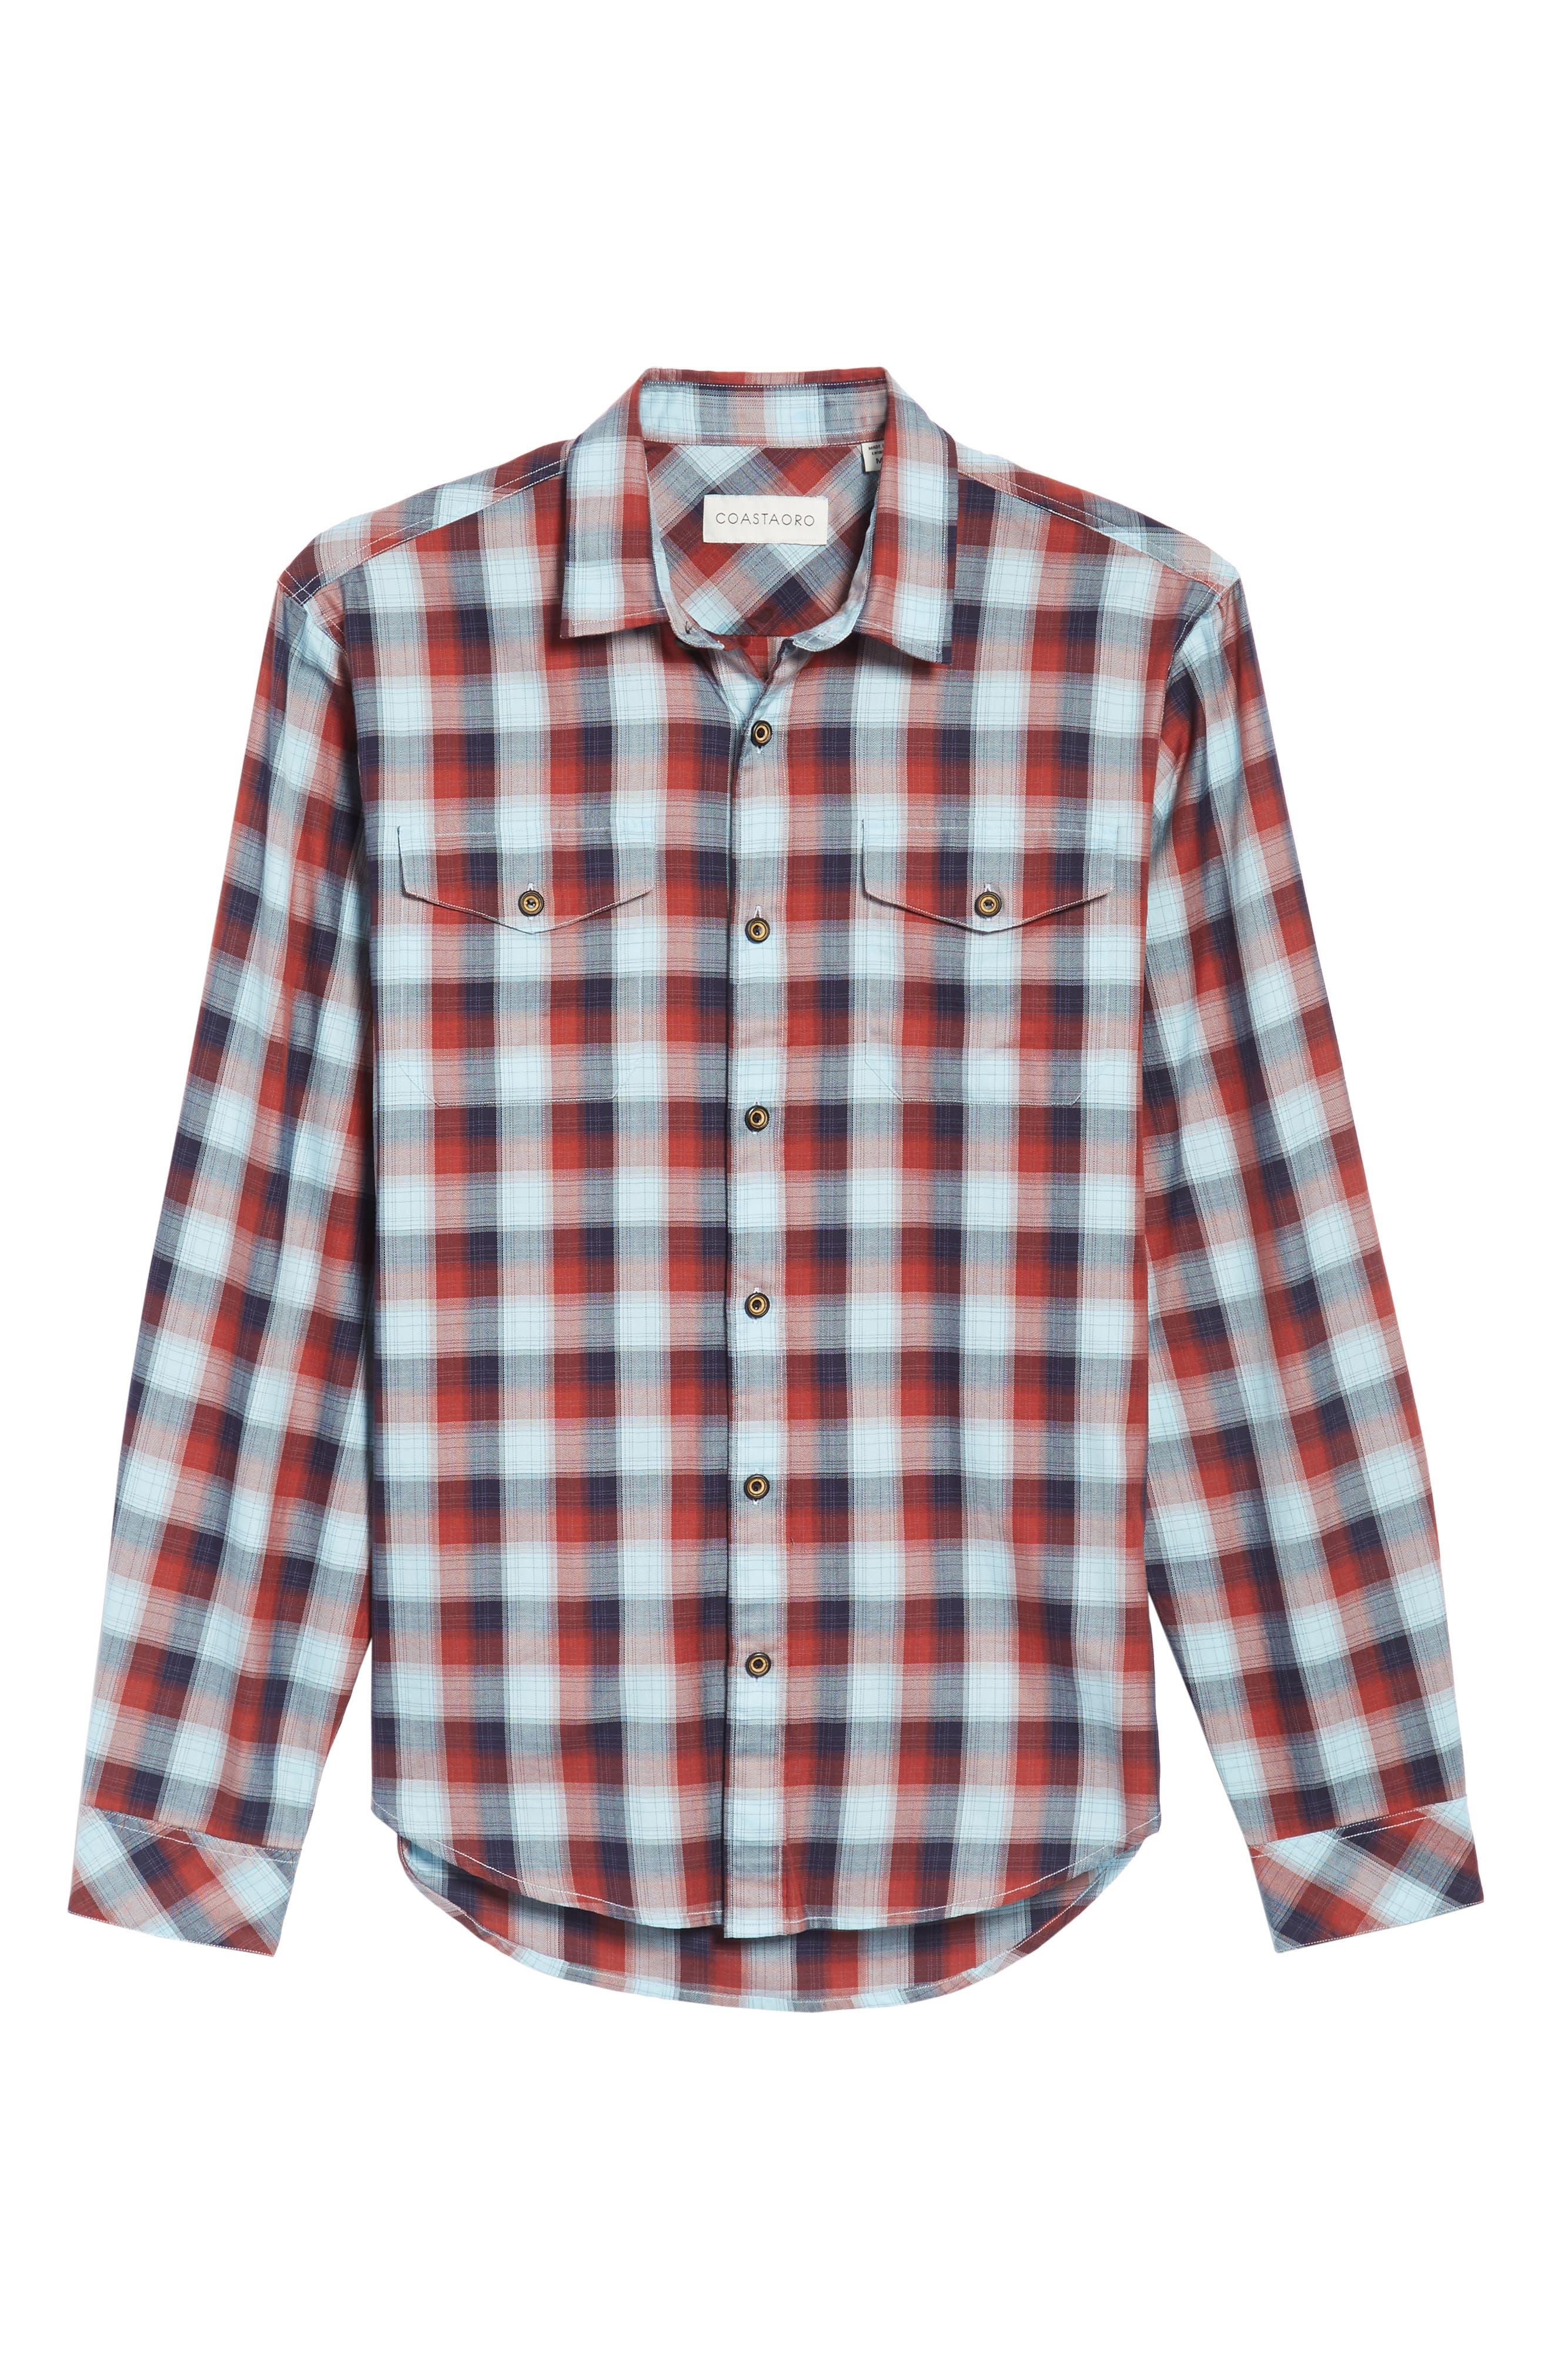 Alternate Image 6  - Coastaoro Redford Check Flannel Shirt